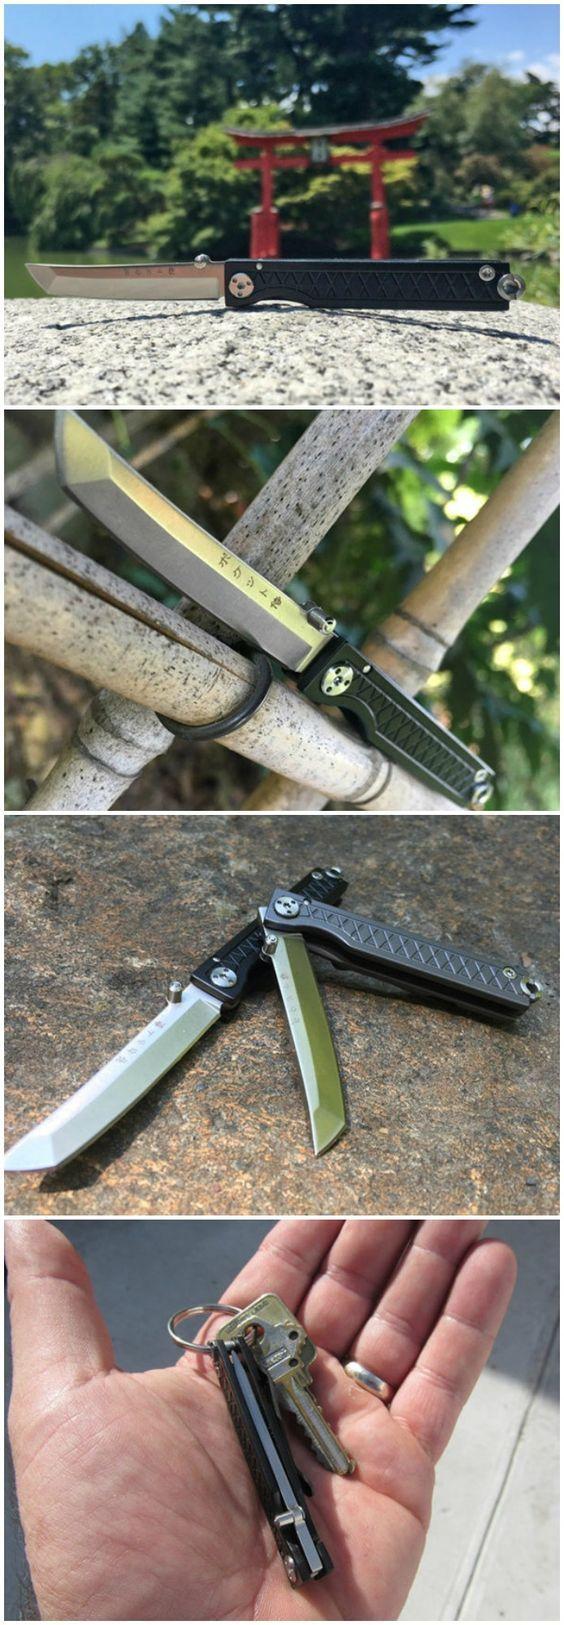 Pocket Samurai Titanium Keychain Knife - Perform Everyday Tasks Like a Samurai with This Tiny, Convenient Knife.